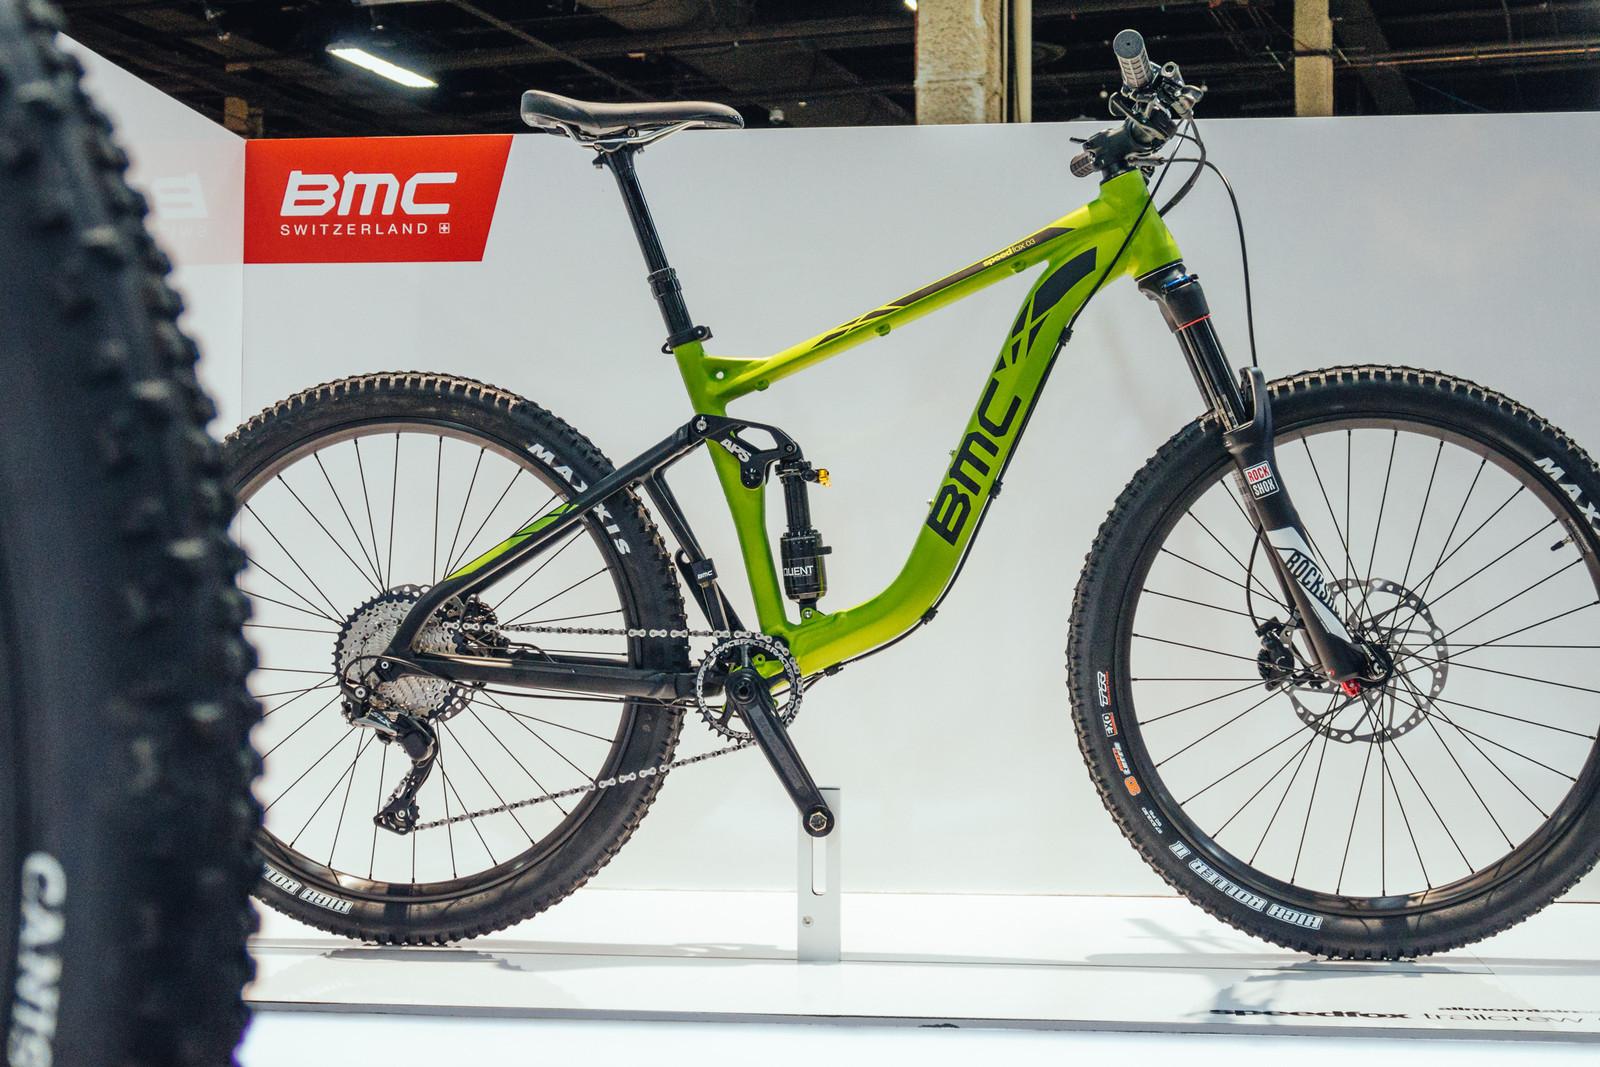 ea793e1d676 ... Bmc Mountain Bikes: 2017 BMC Speedfox Trailcrew 03